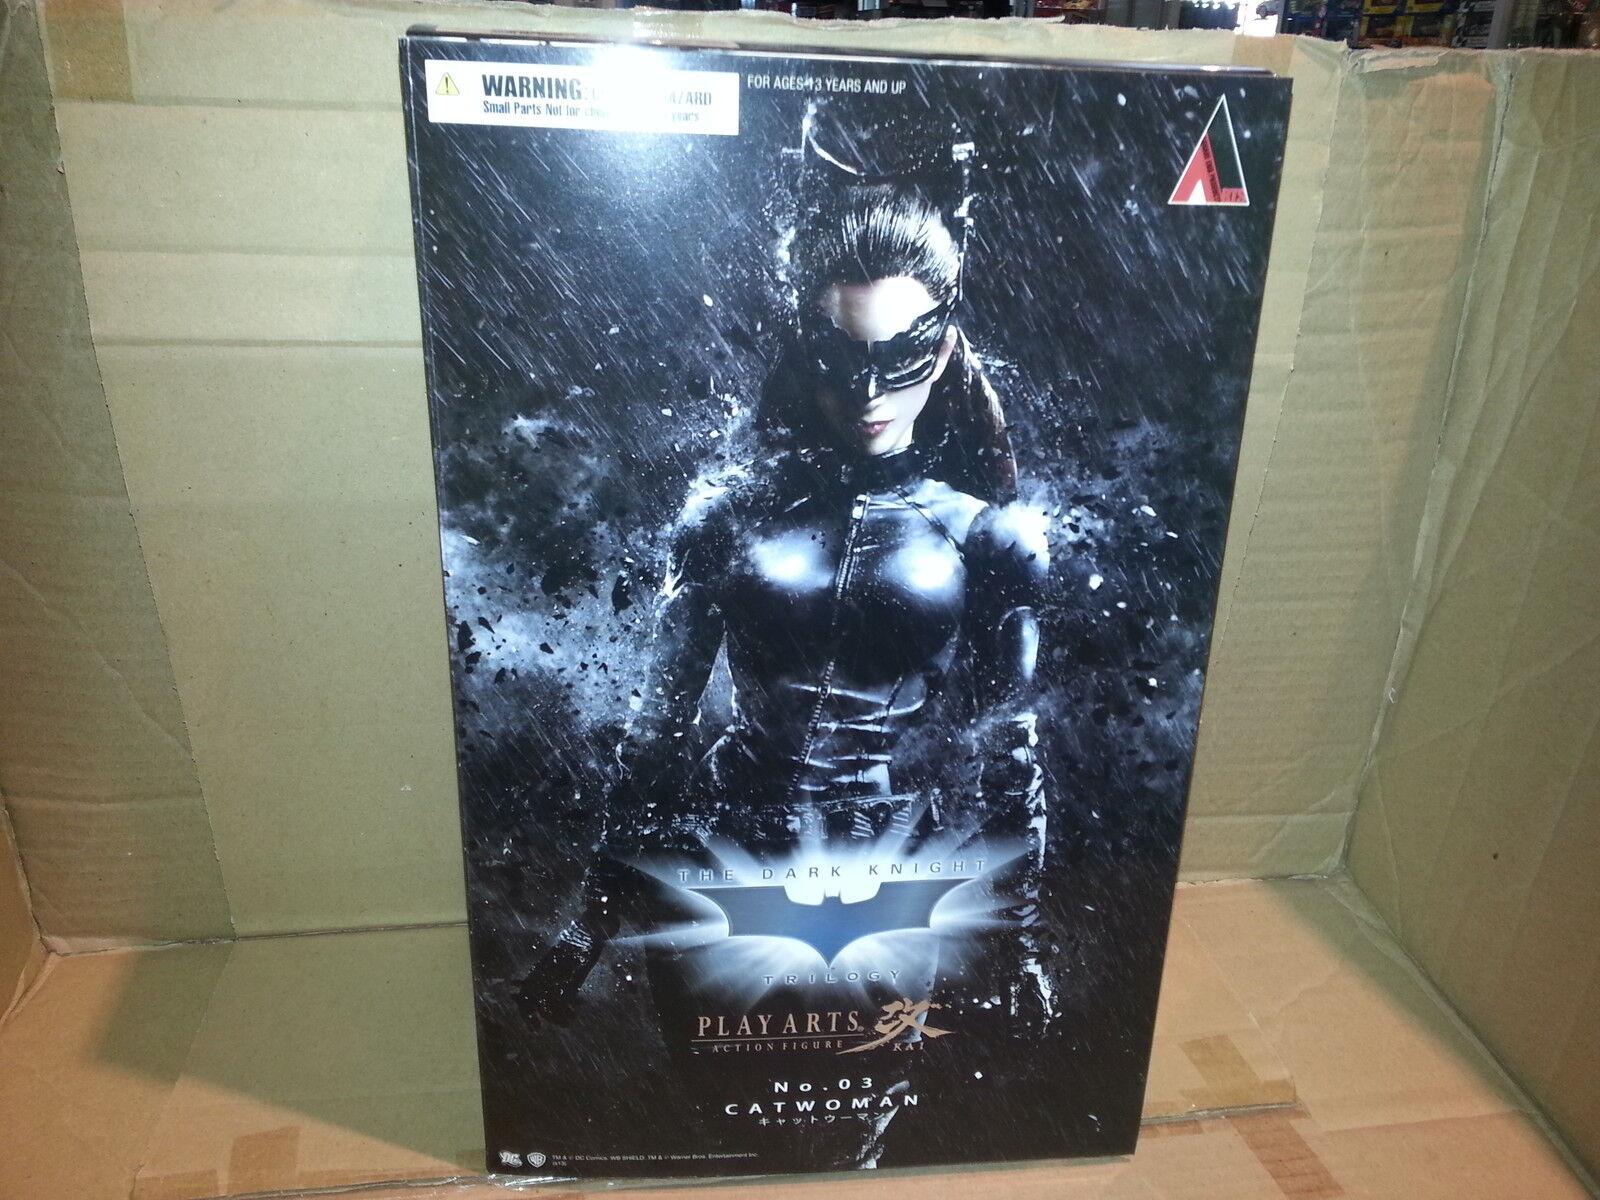 PlayartsThe PlayartsThe PlayartsThe Dark Knight Catwoman Figure ea4d55